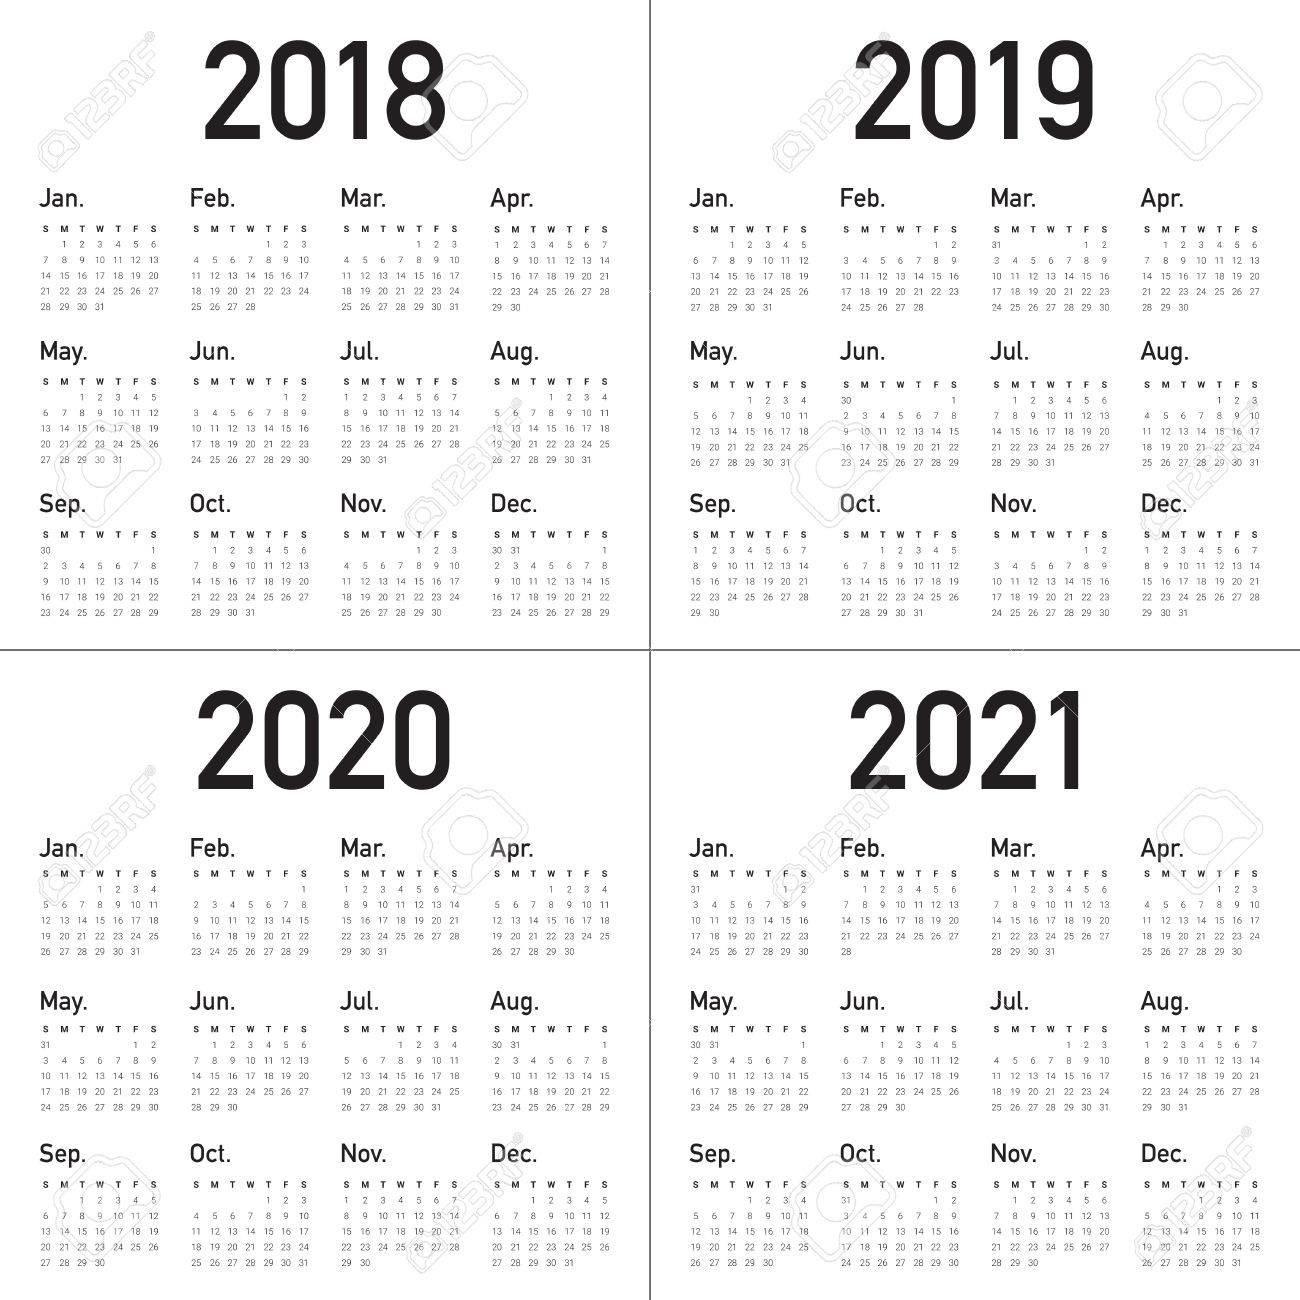 Year 2018 2019 2020 2021 Calendar Vector Design Template, Simple Calendar 2019 And 2020